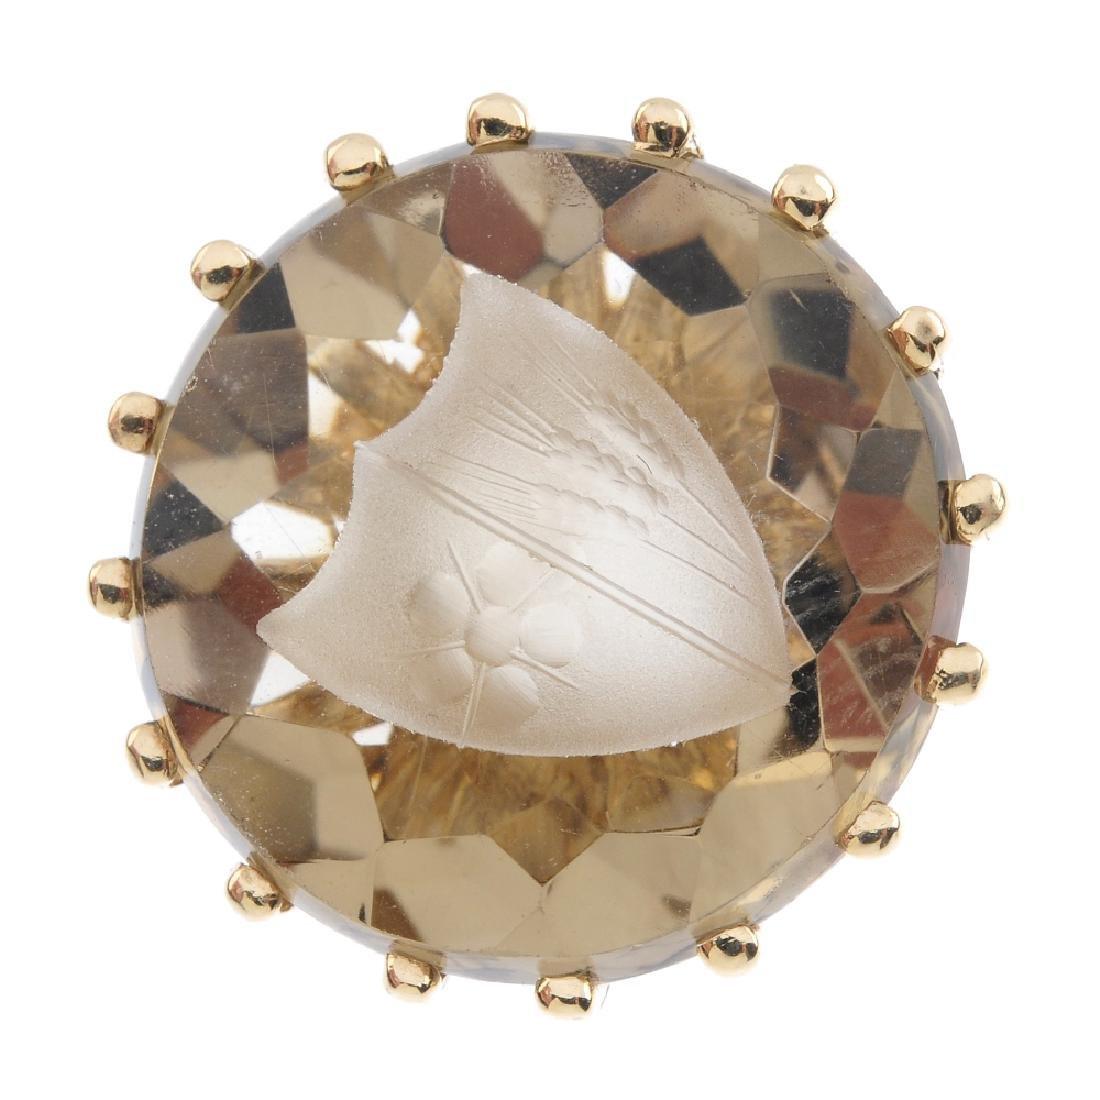 A gold smoky quartz signet ring. The circular smoky